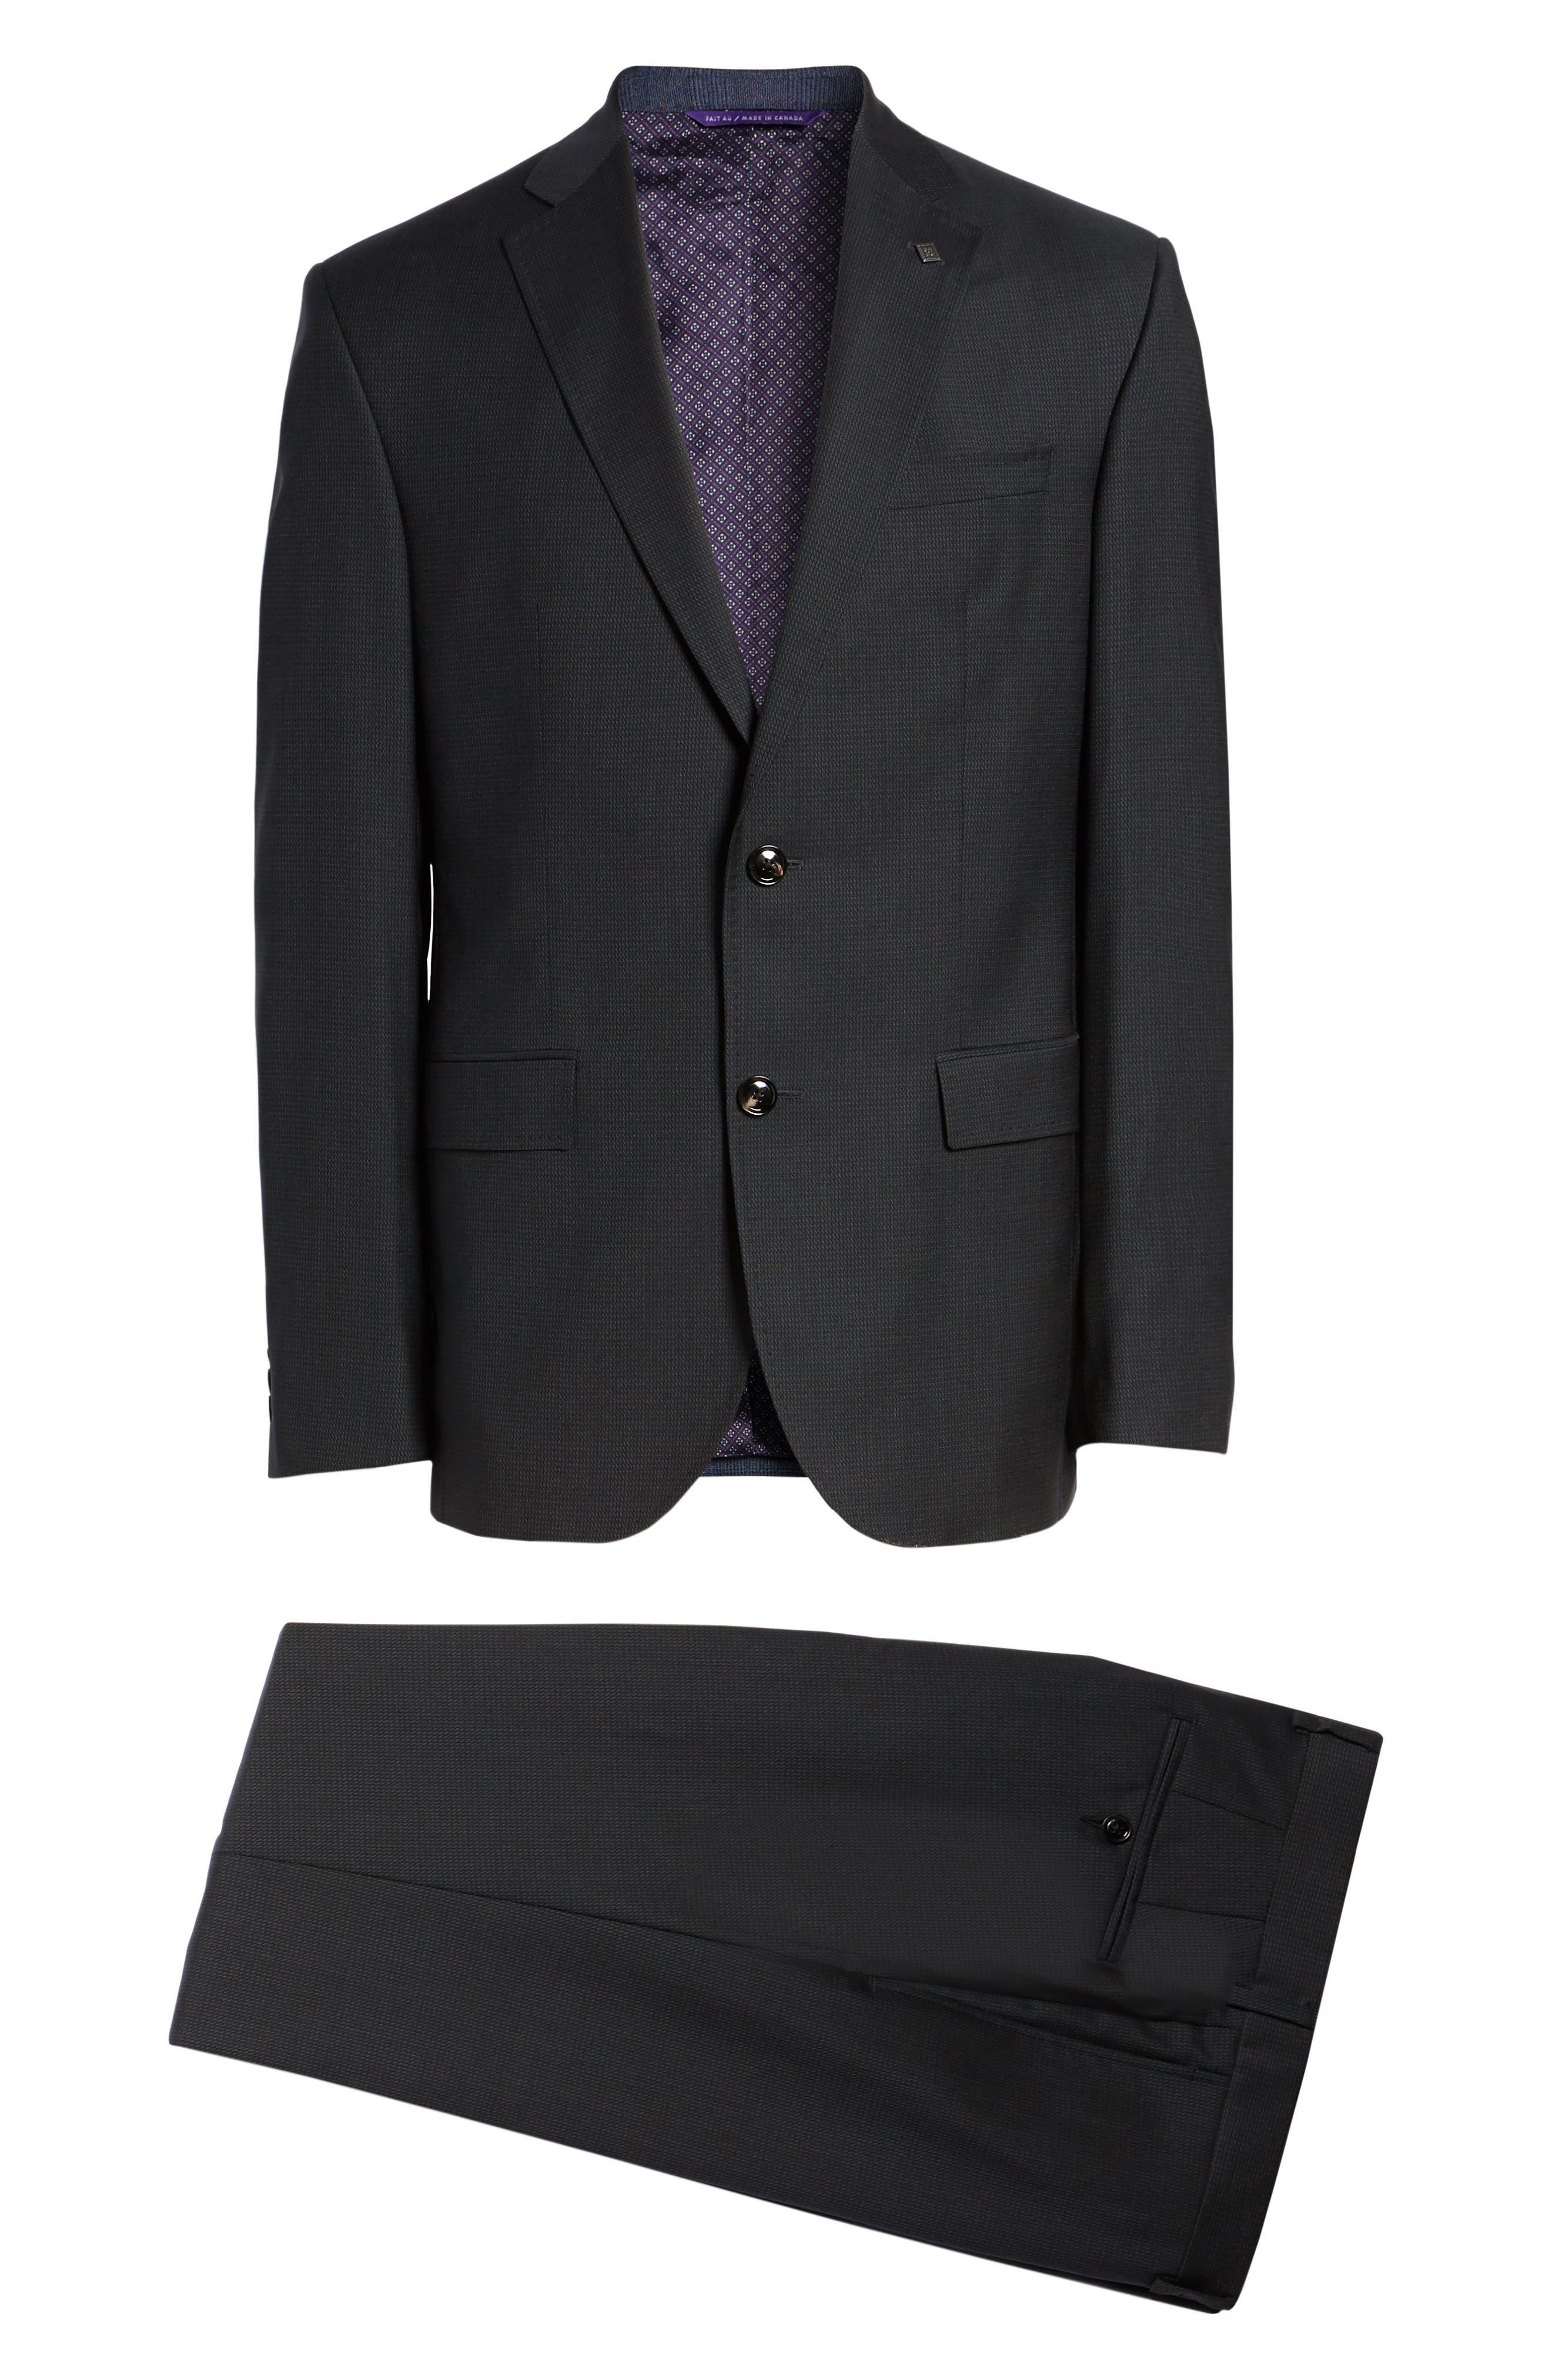 Roger Trim Fit Solid Wool Suit,                             Alternate thumbnail 8, color,                             001